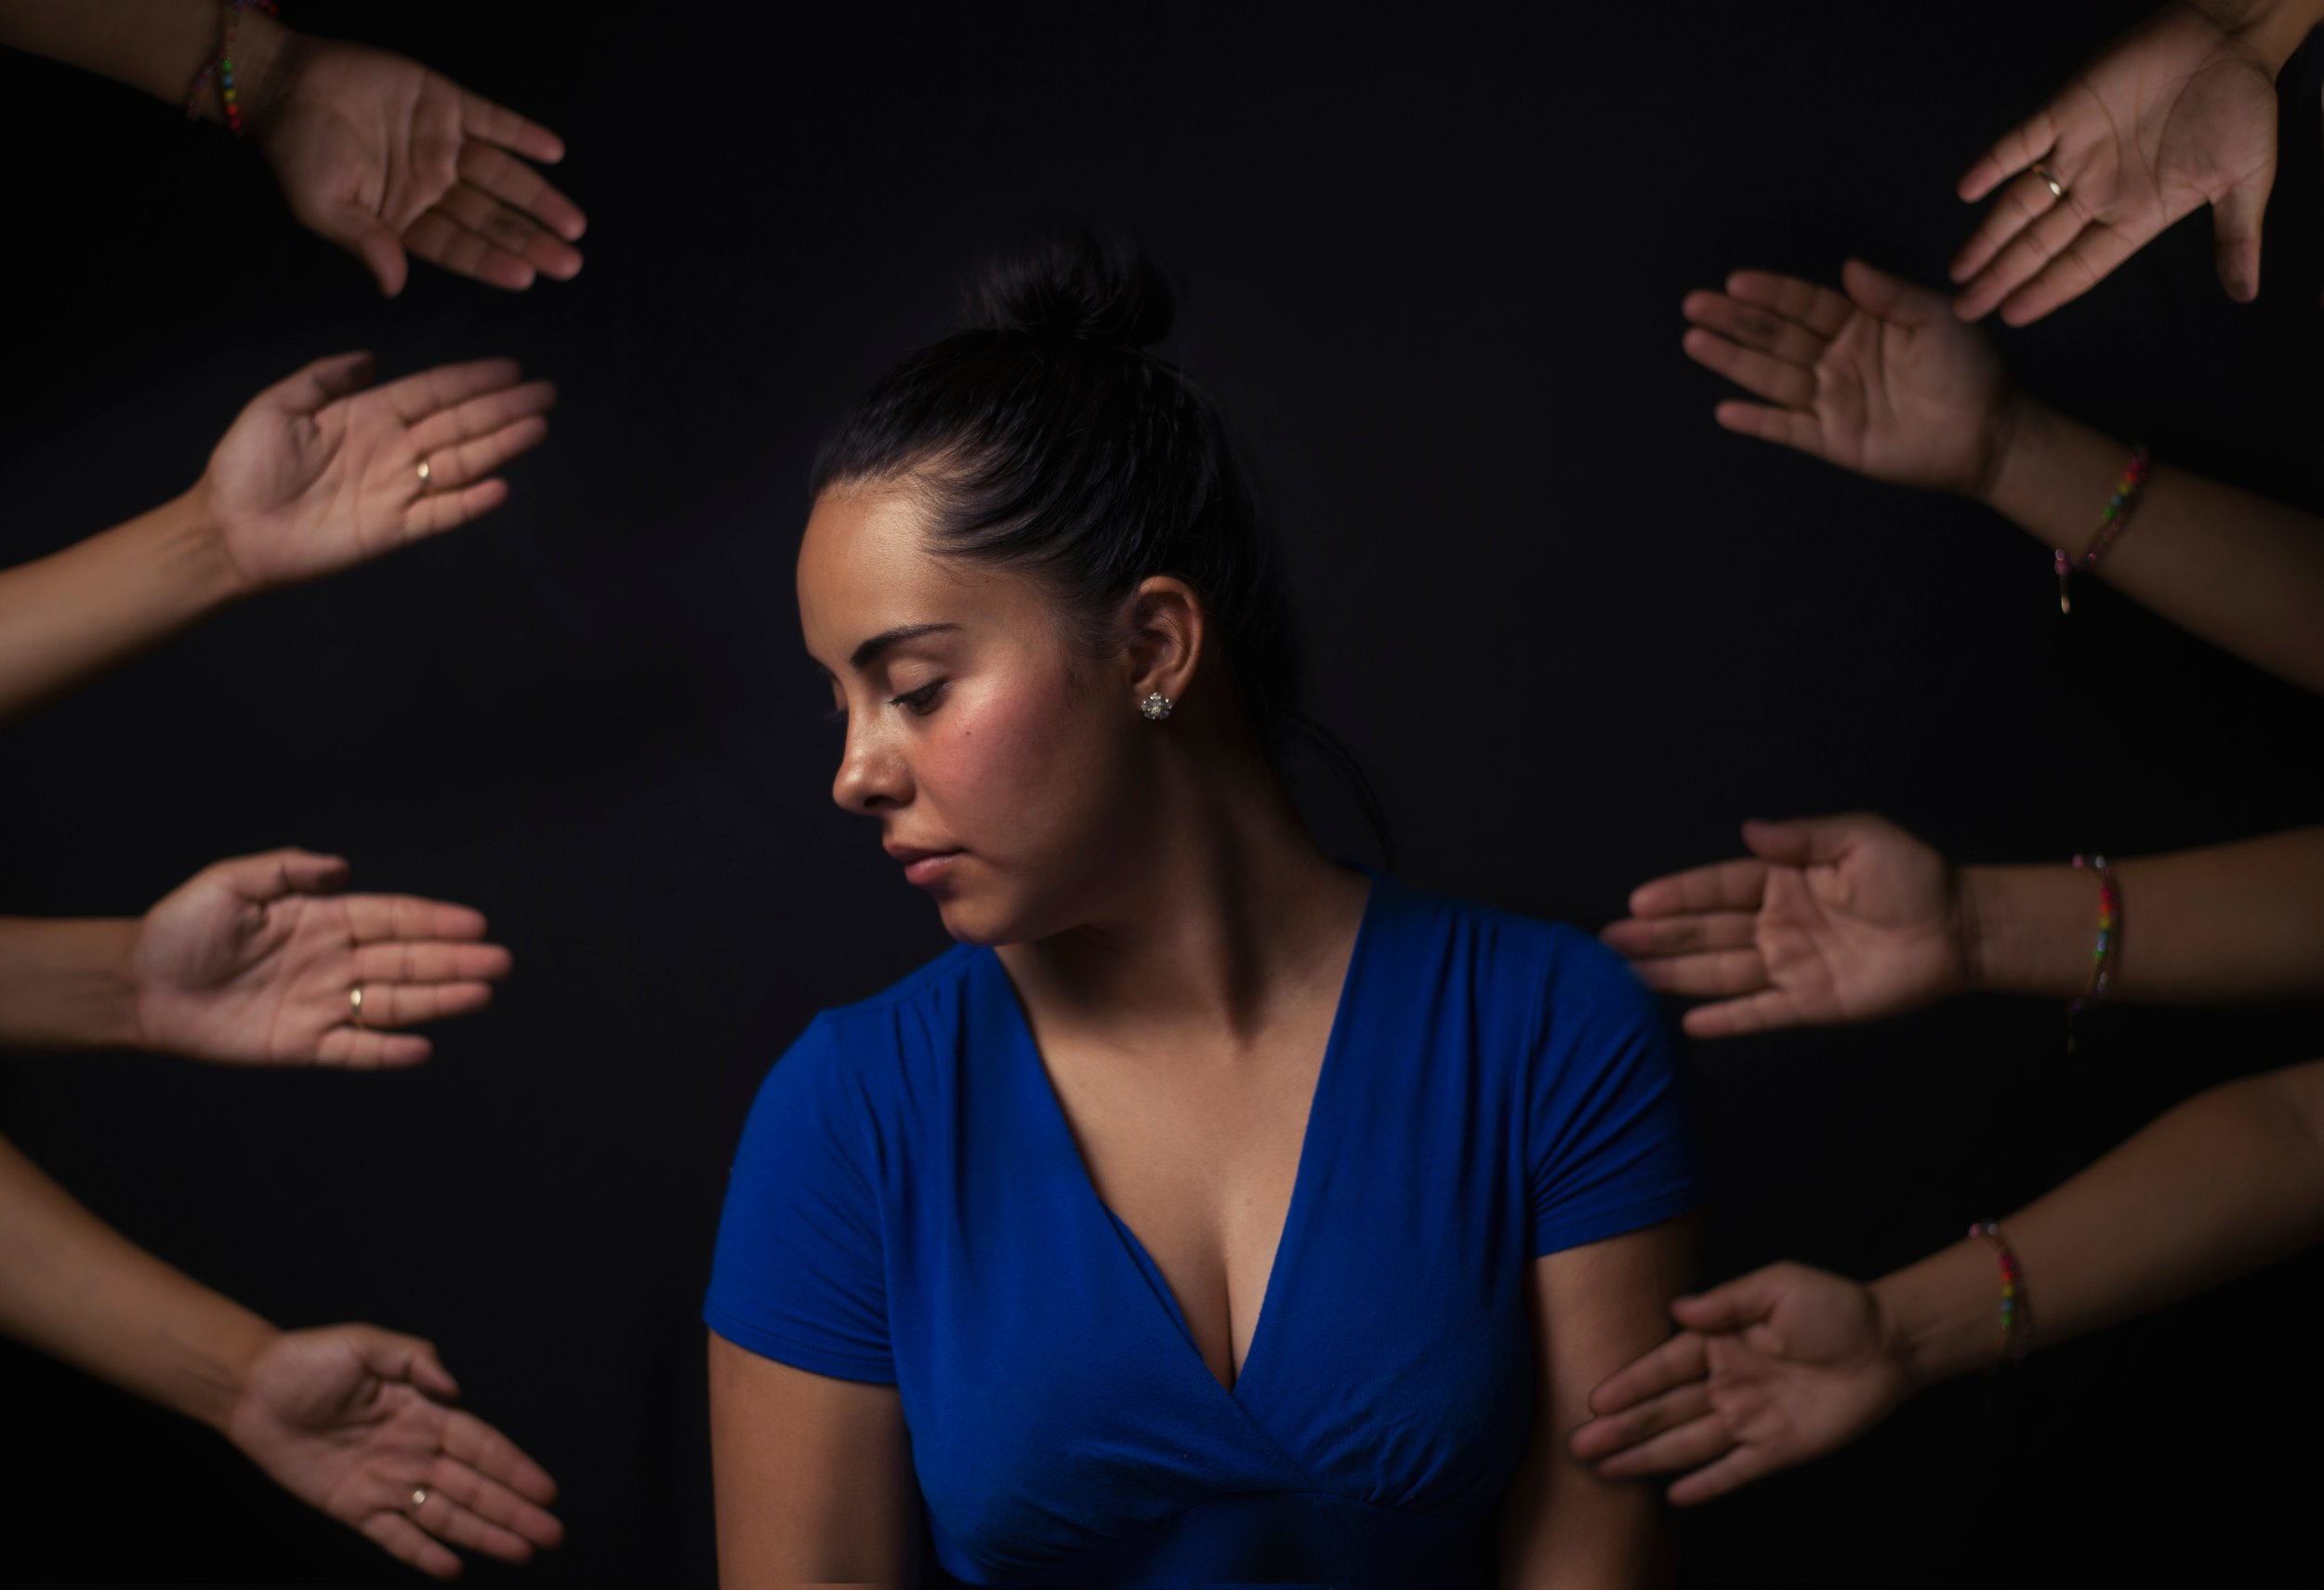 Chelsea Crow, Female Trauma Therapist